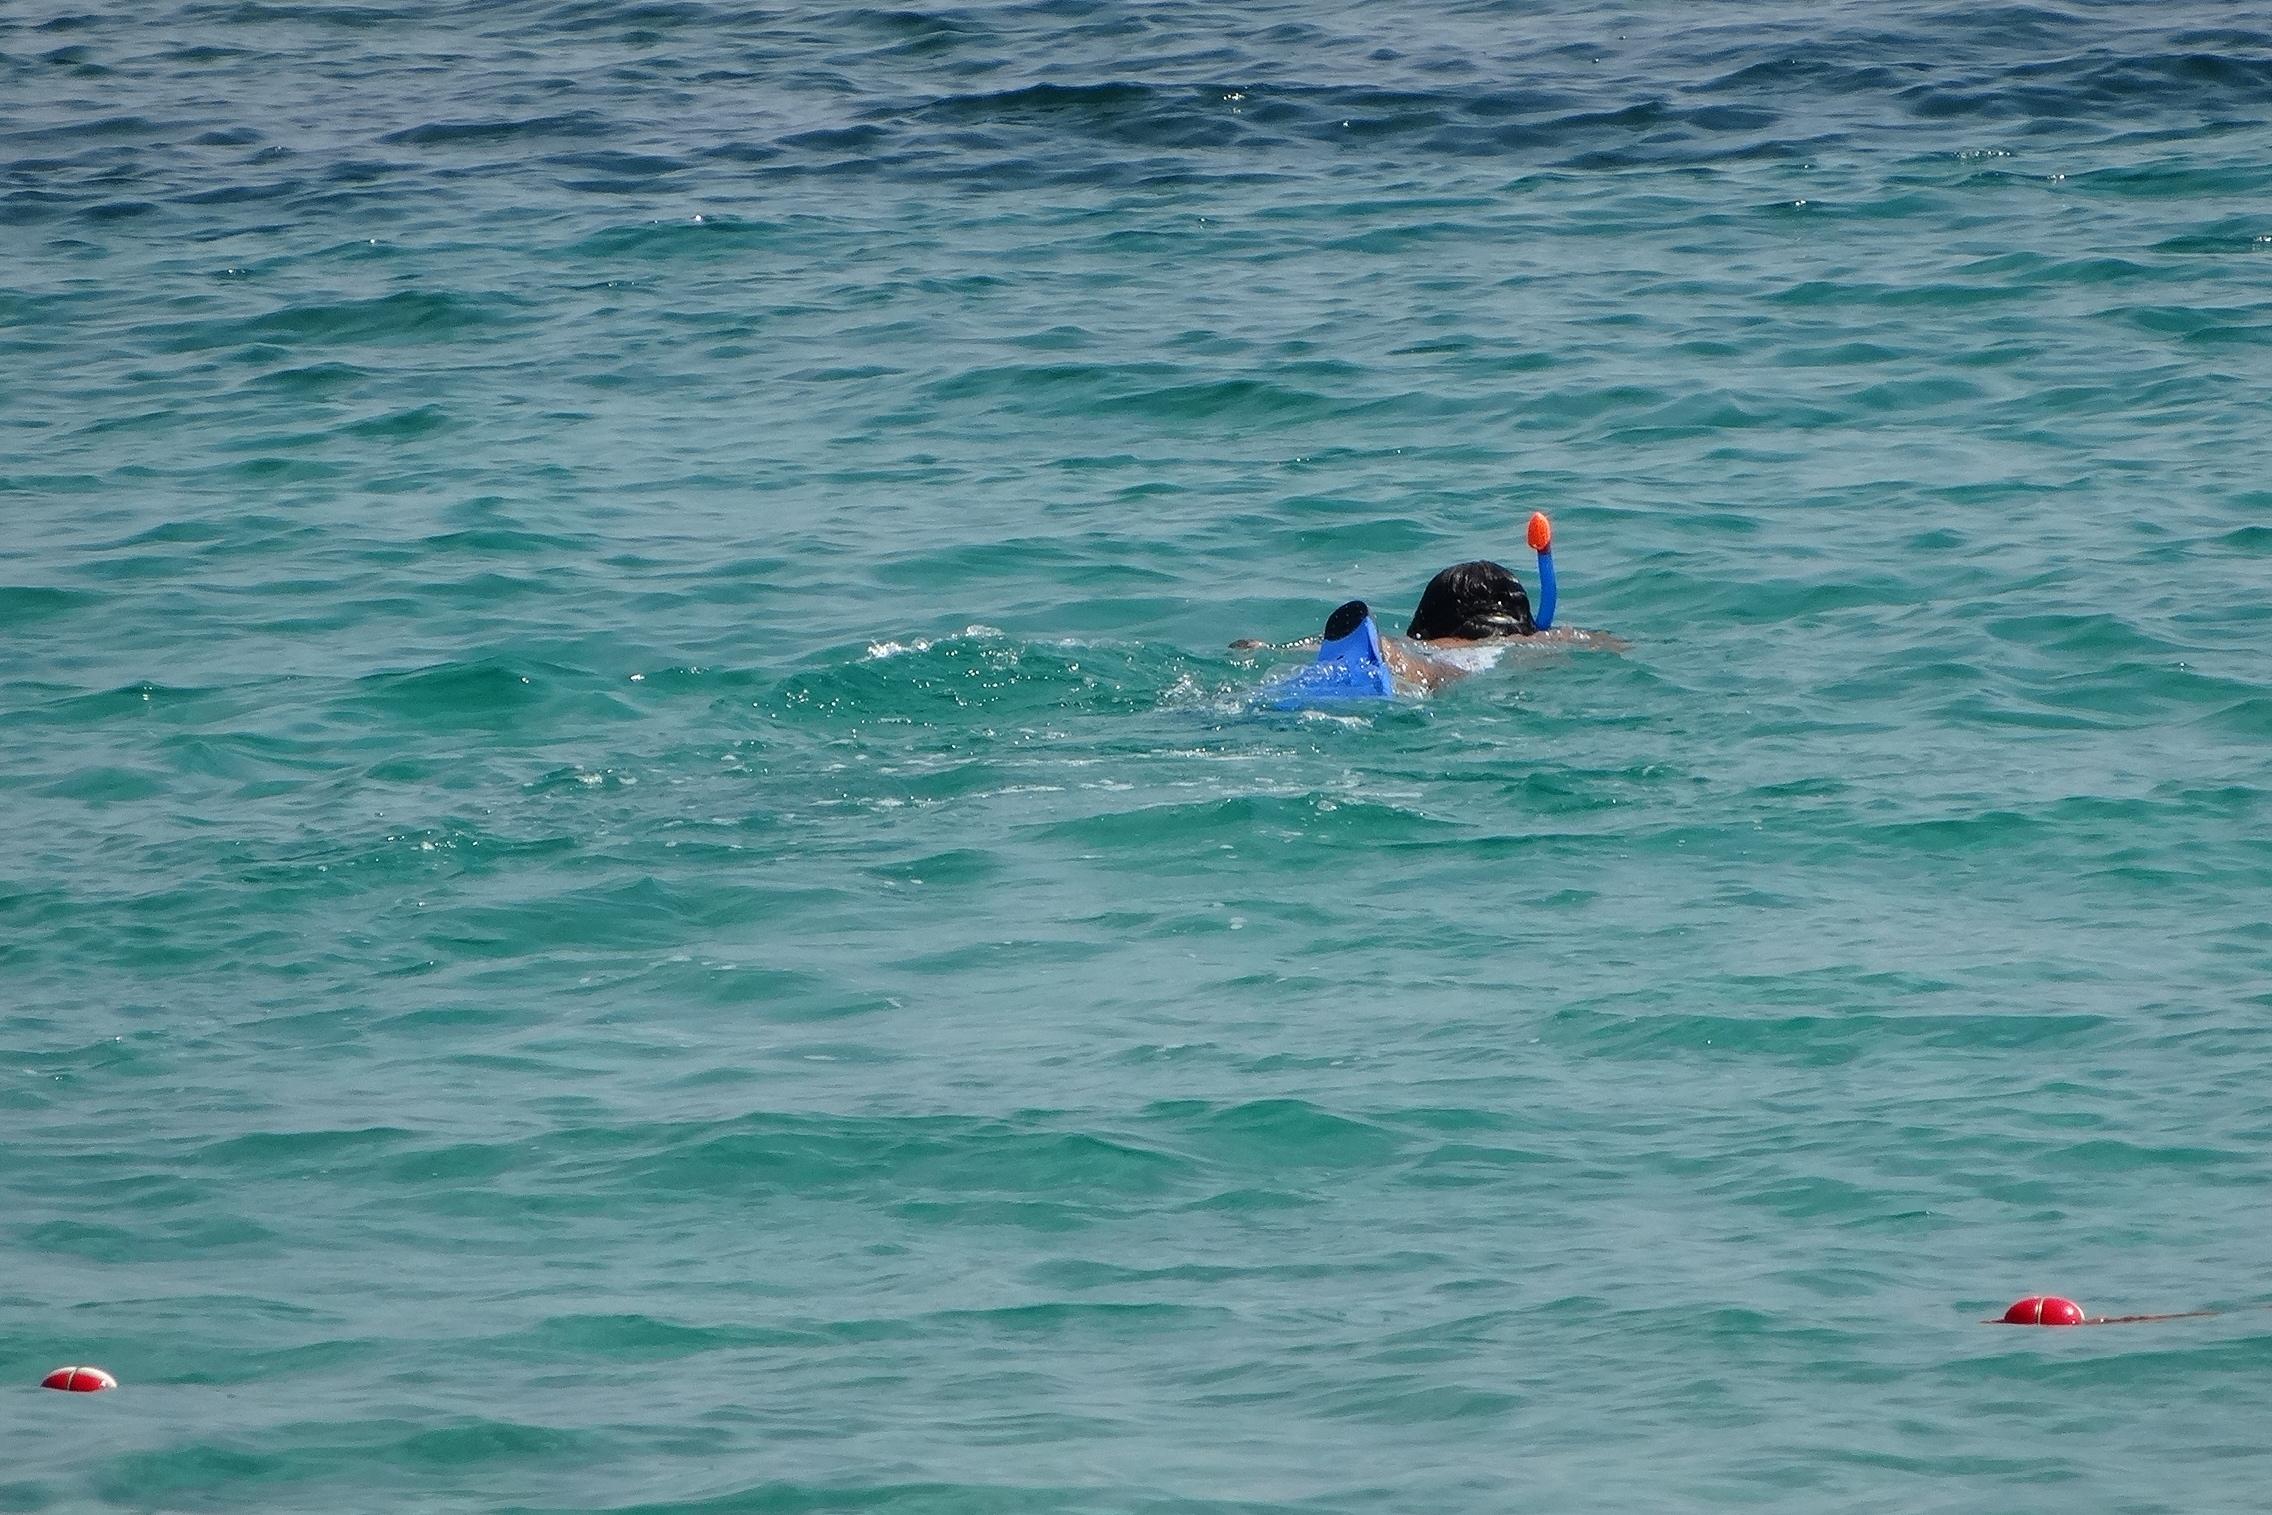 diving for the golf balls / Golfbälle tauchen